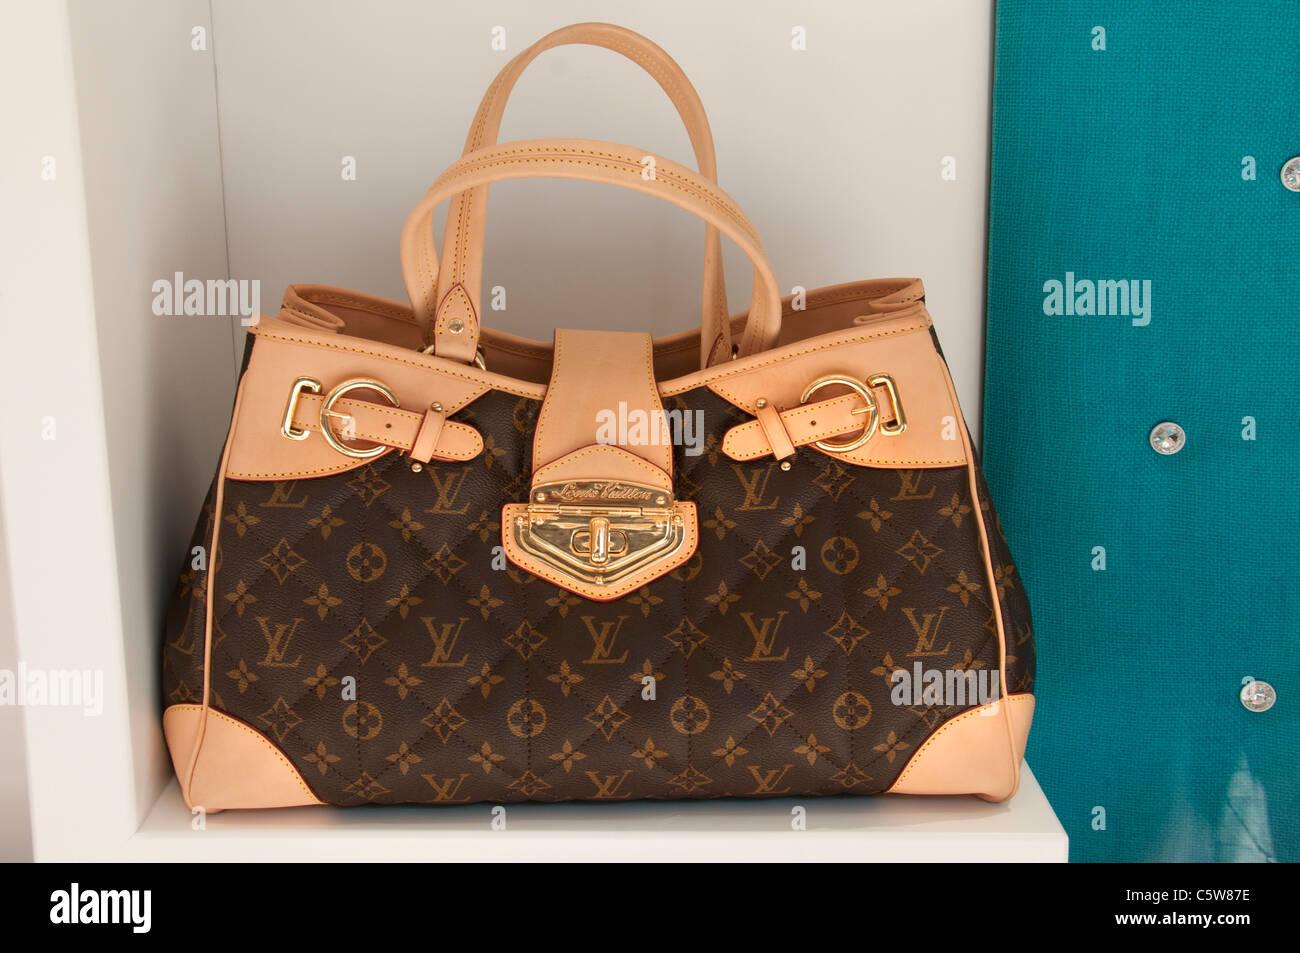 fe242de015 Louis Vuitton mock imitazione falso falso sham borsa borse Turchia Bagno  Turco